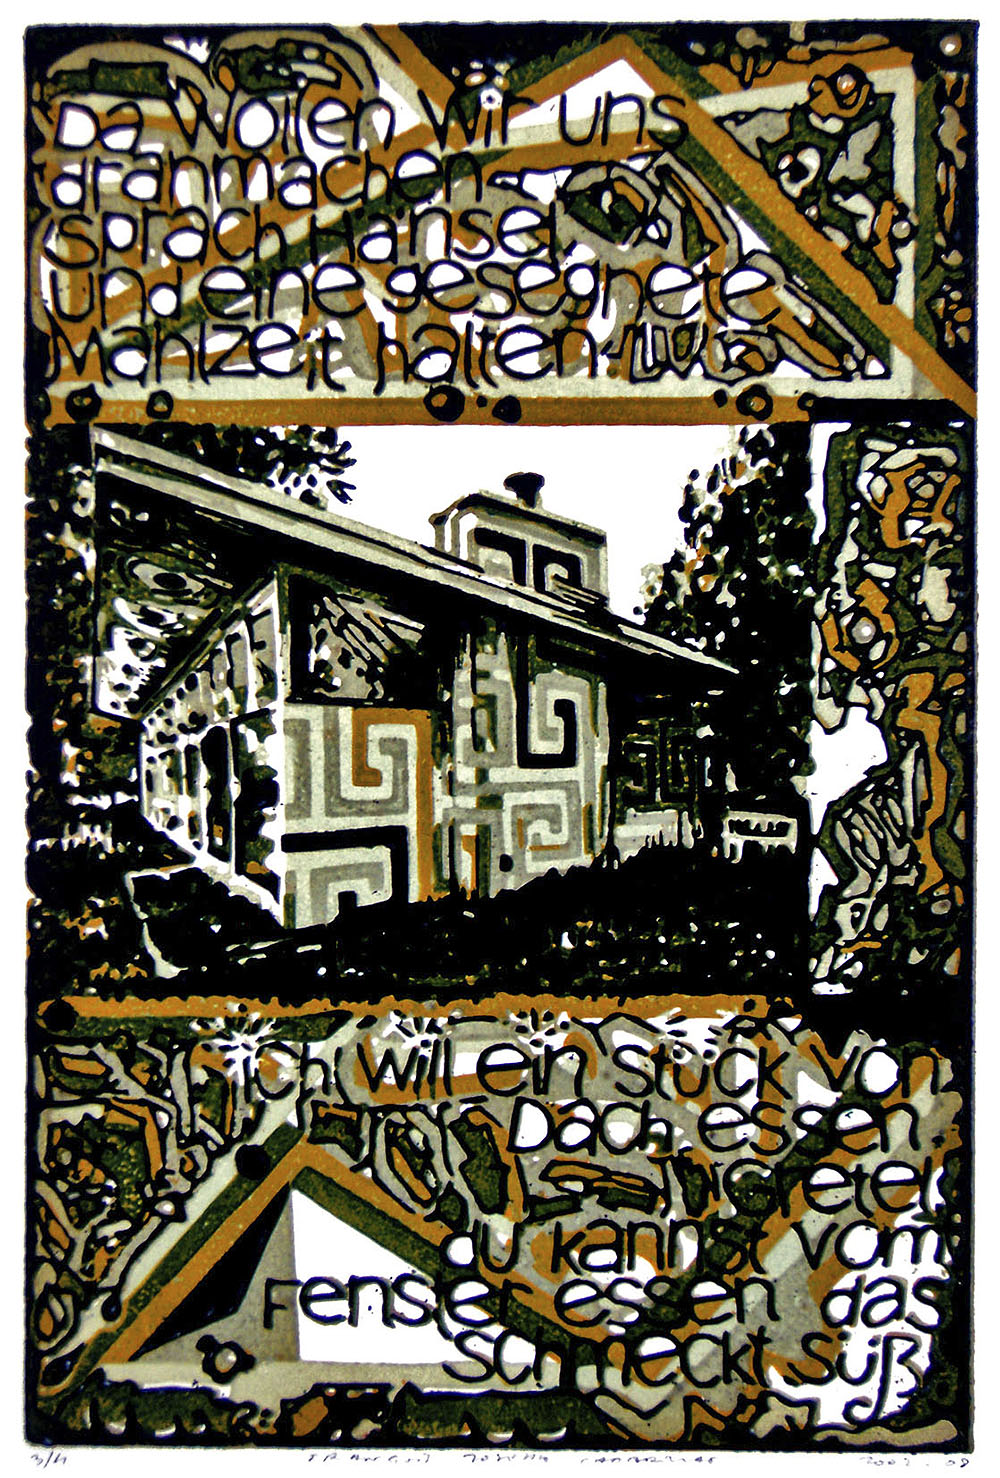 o. T. (Hänsel und Gretel) | 2002 | Farbkartondruck | 33 x 22 cm